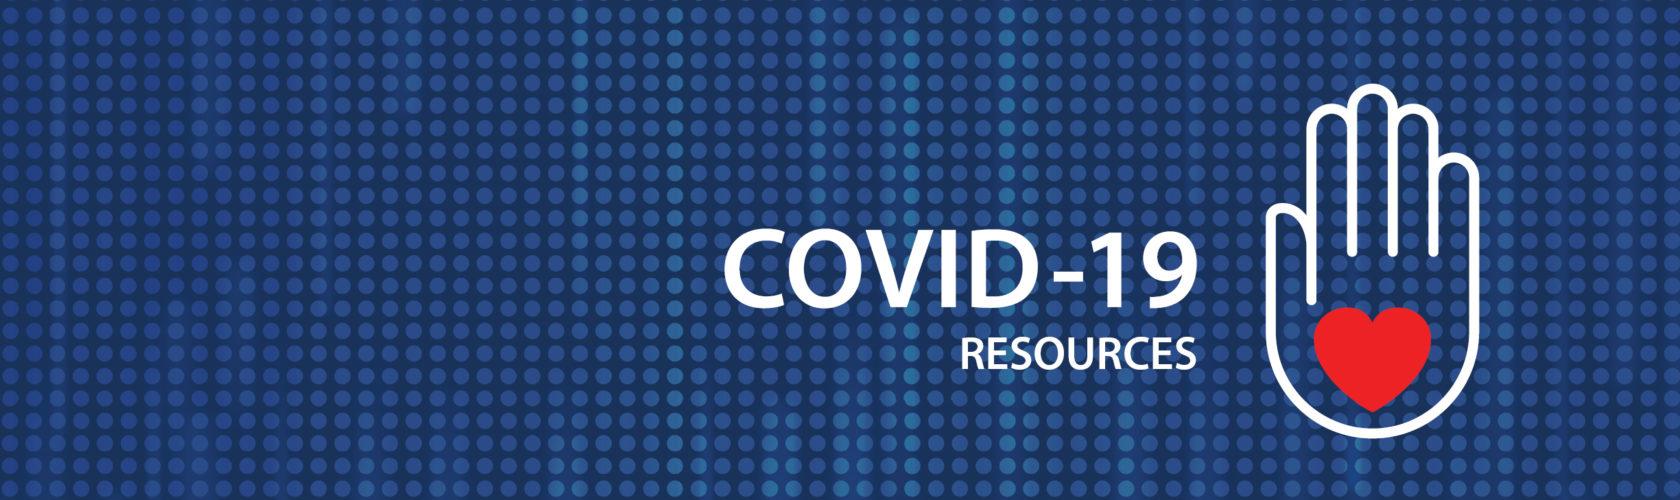 BC Covid Resources graphic